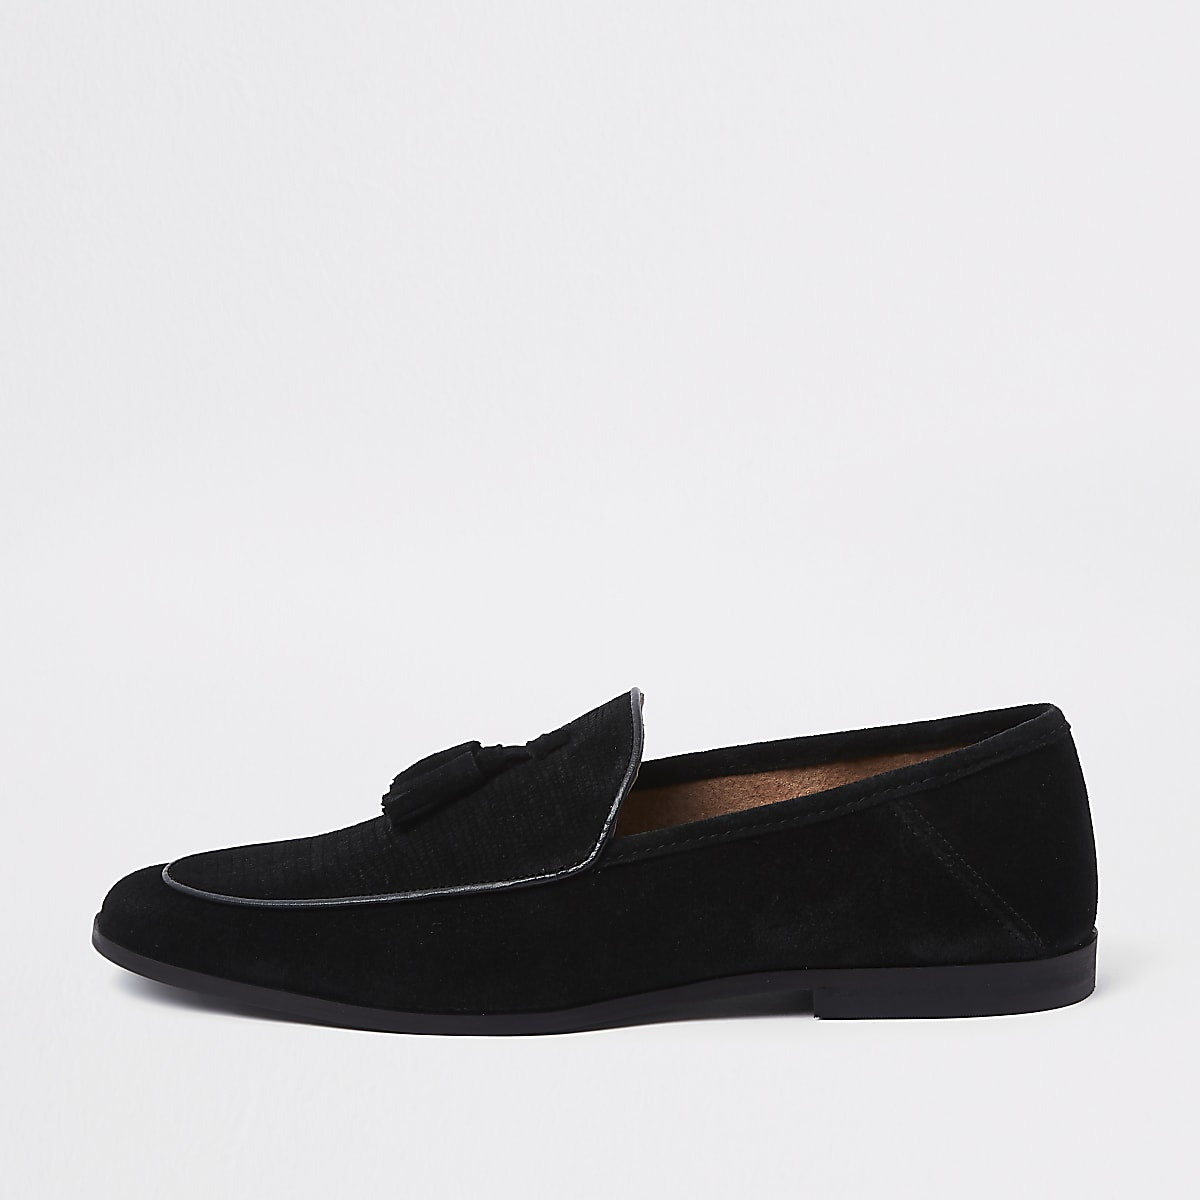 Black textured suede tassel loafer